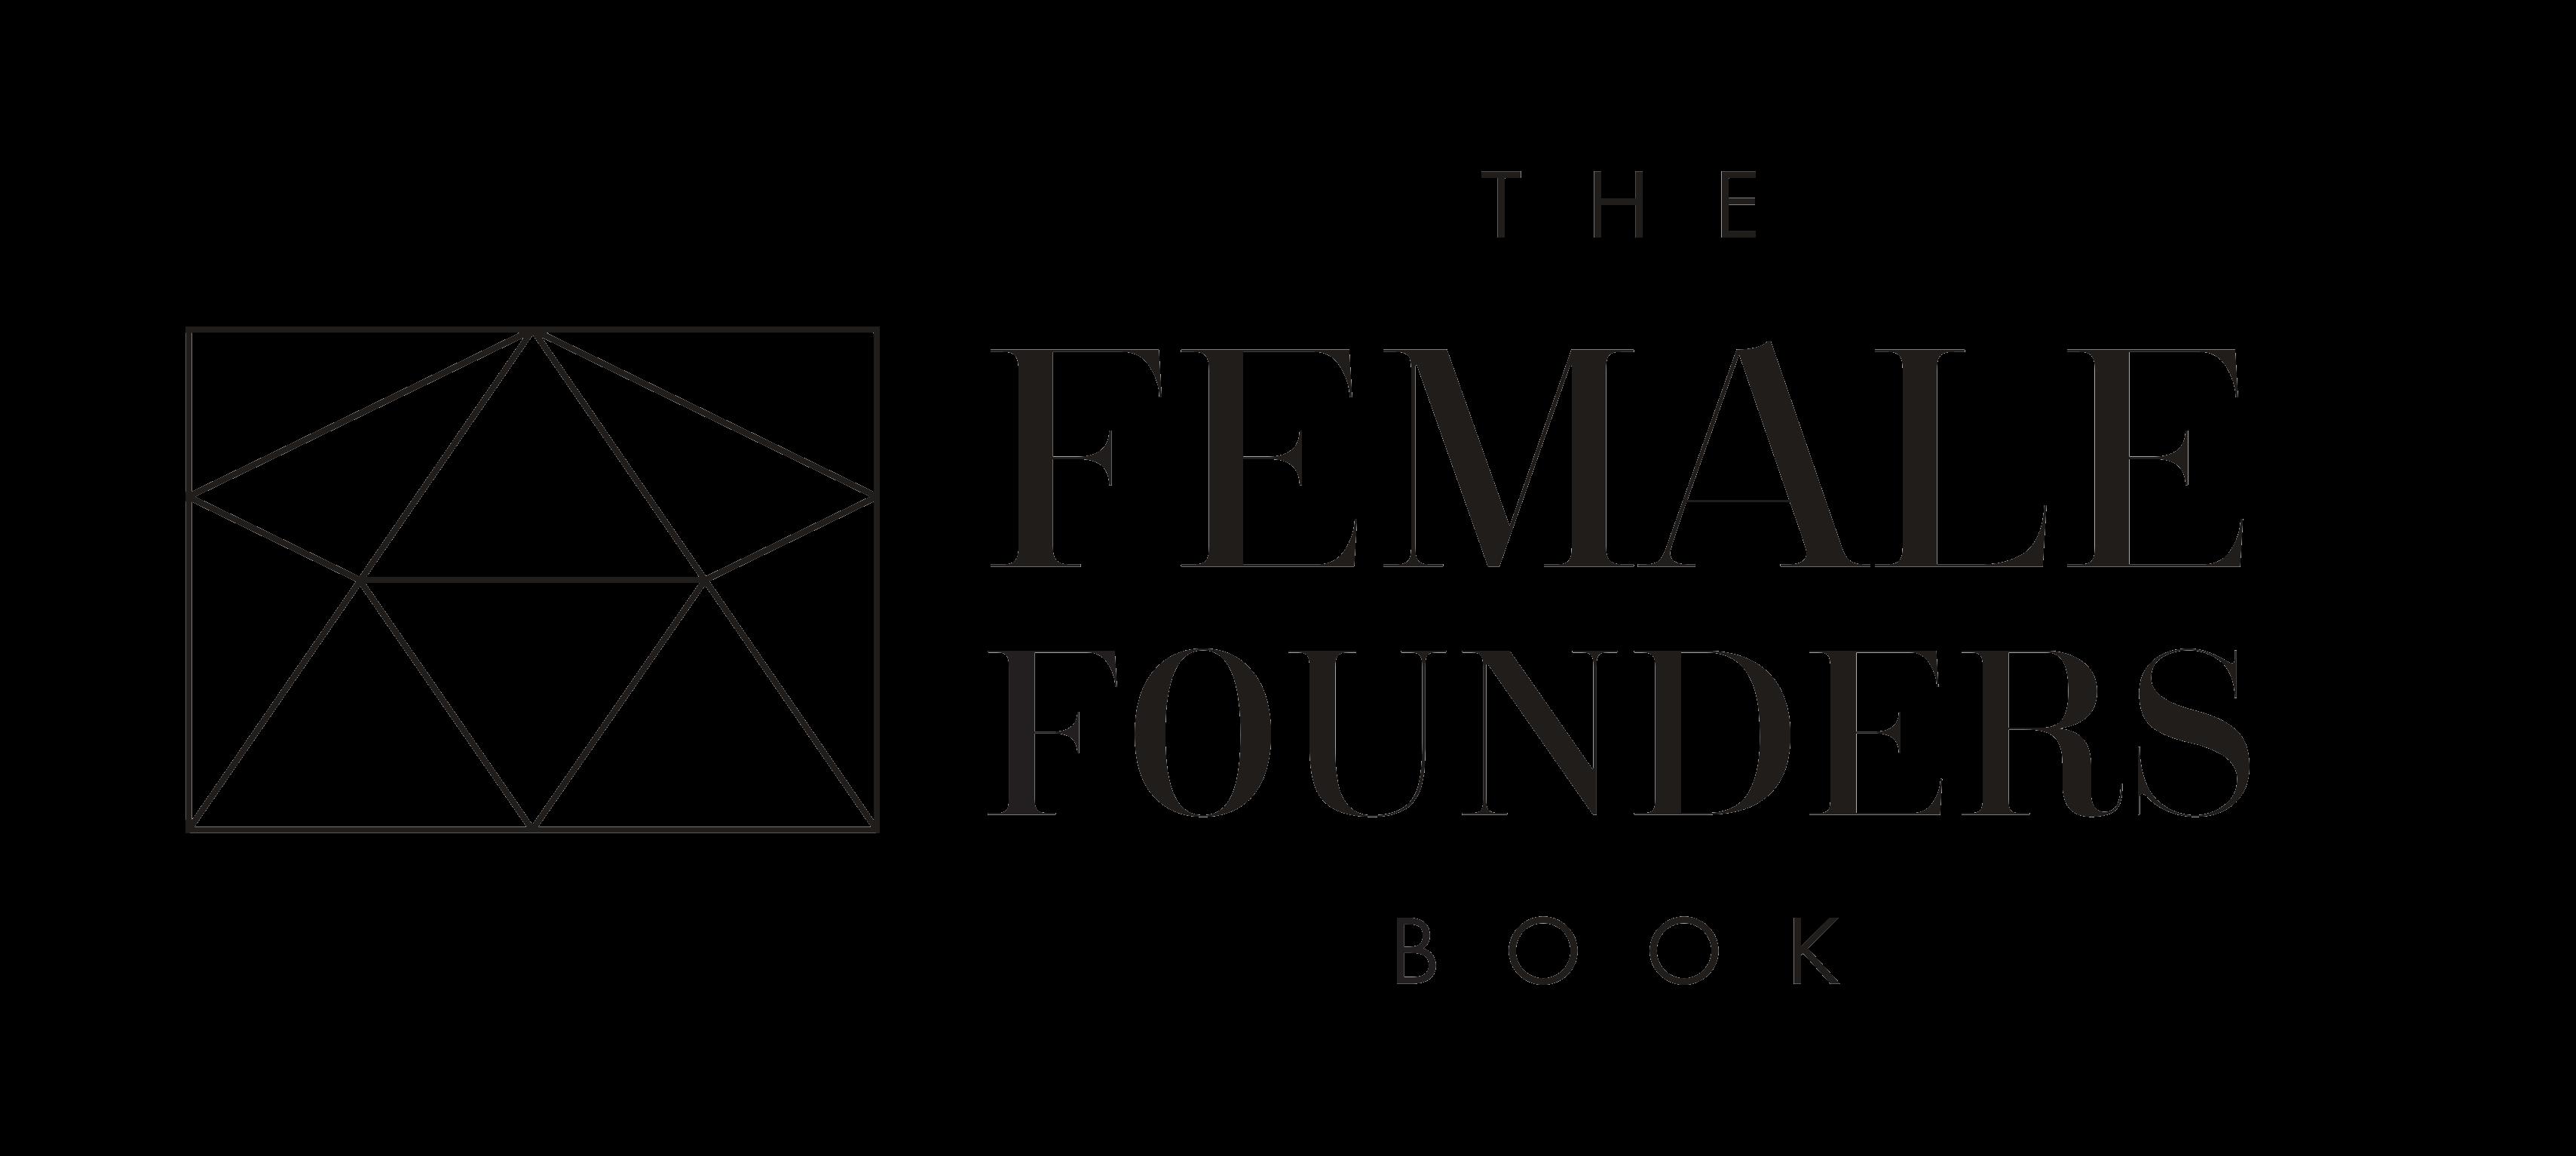 FFBook Logo Black Transparent Background 1